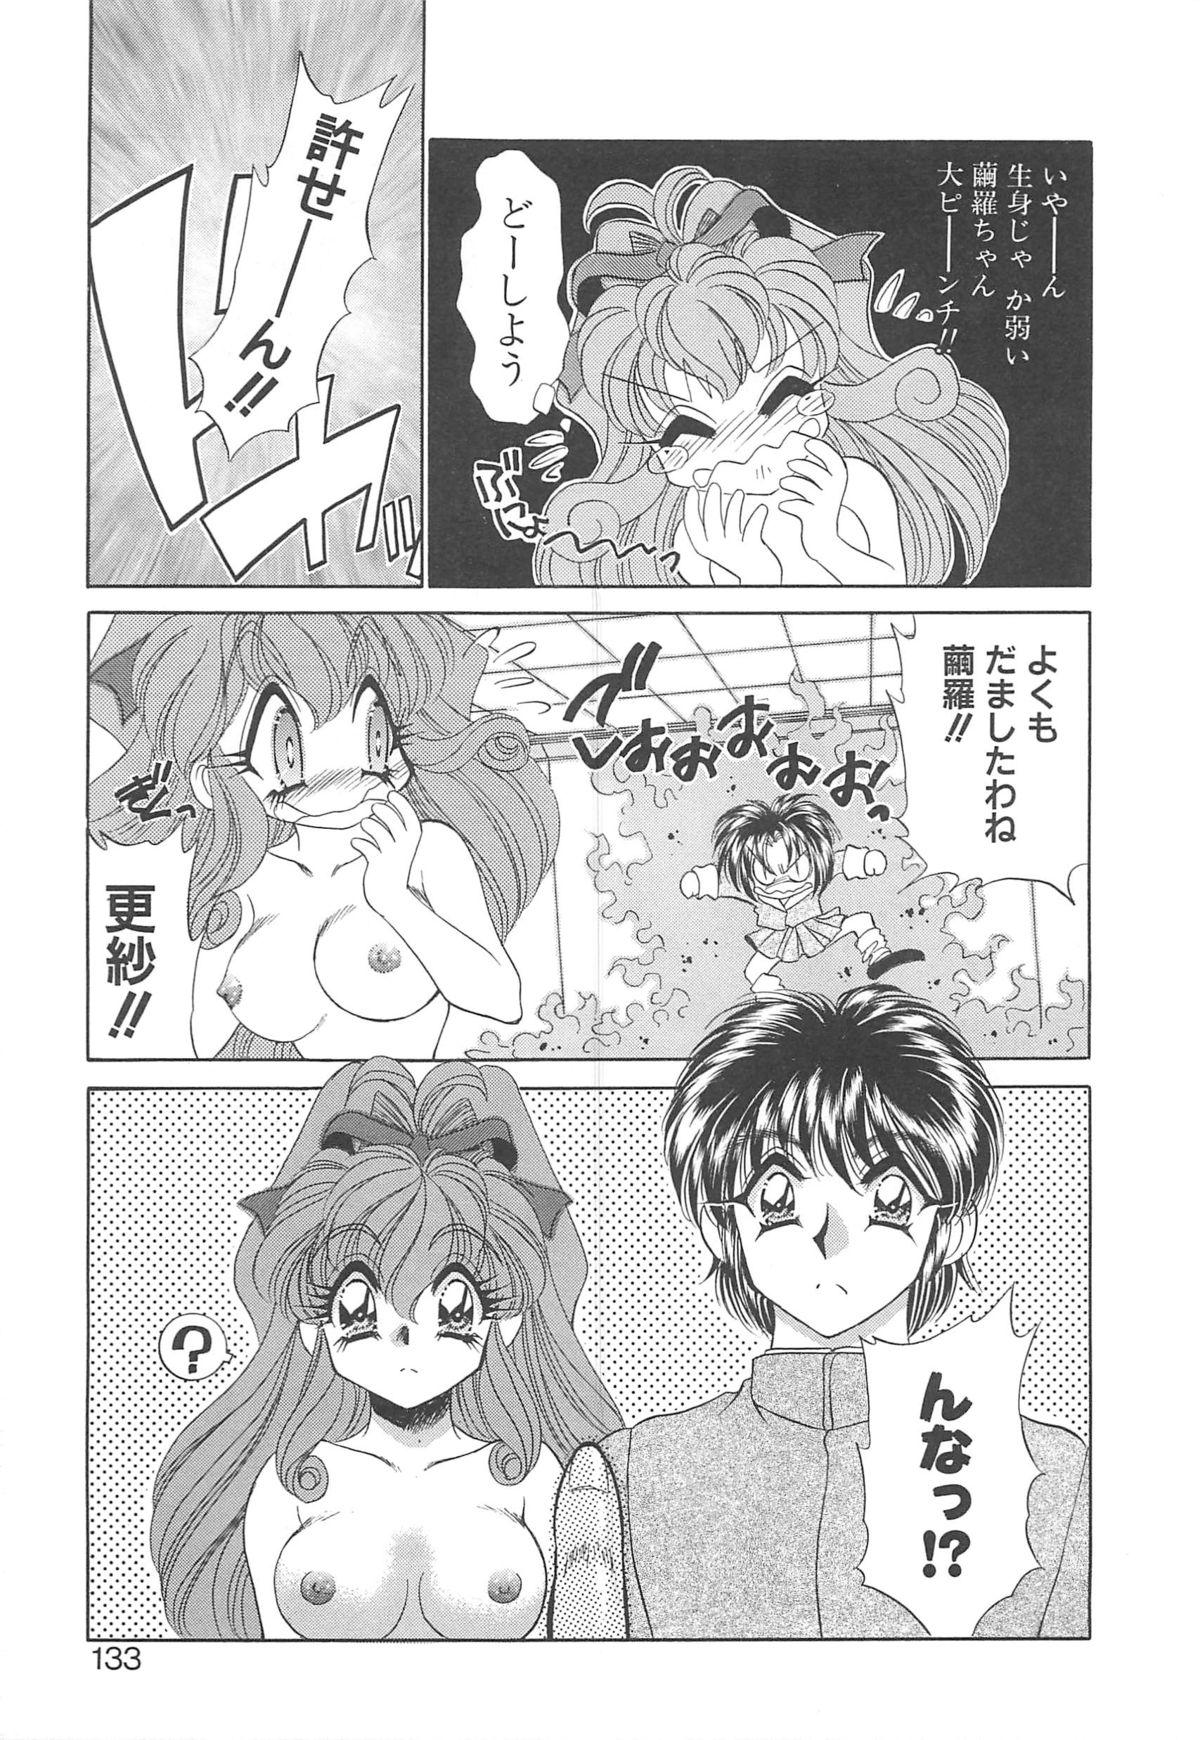 Kigurumi Sentai Quiltian 131